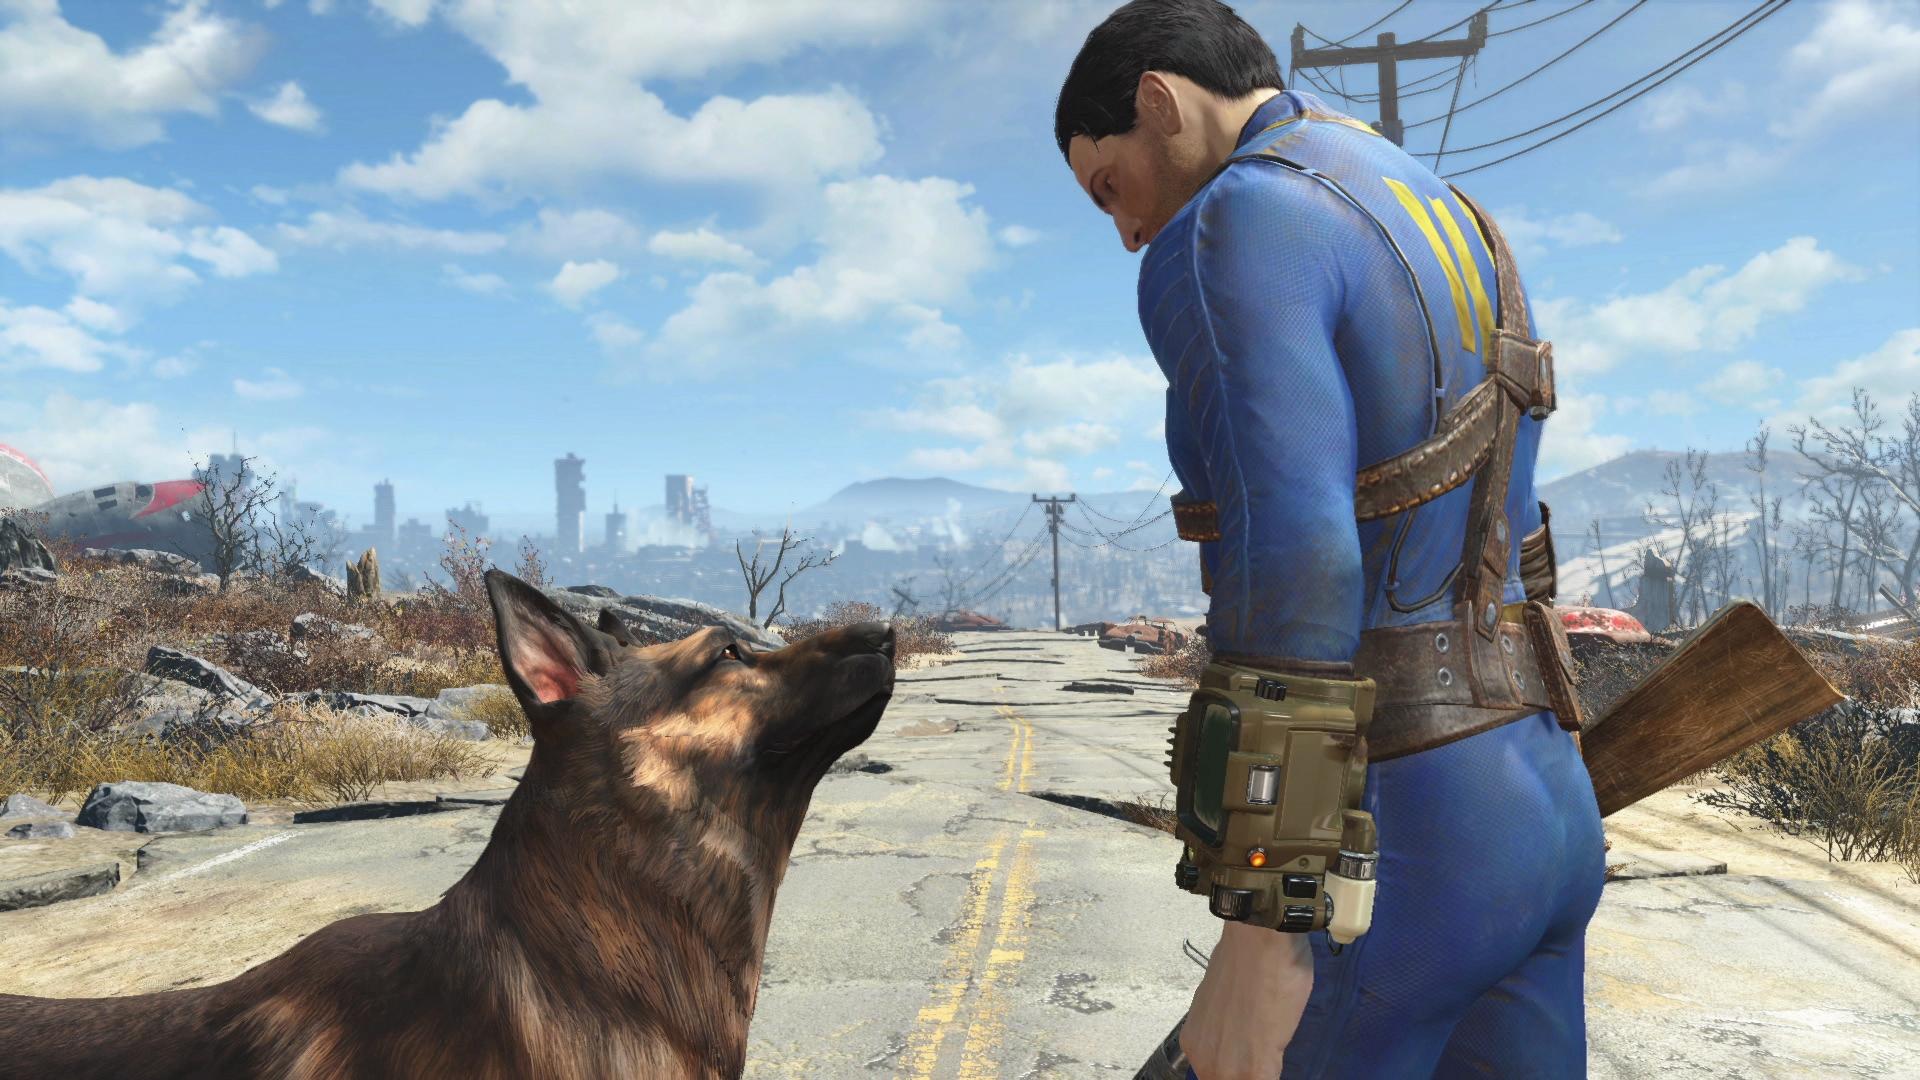 ¿Que te hace S.P.E.C.I.A.L. en Fallout 4?